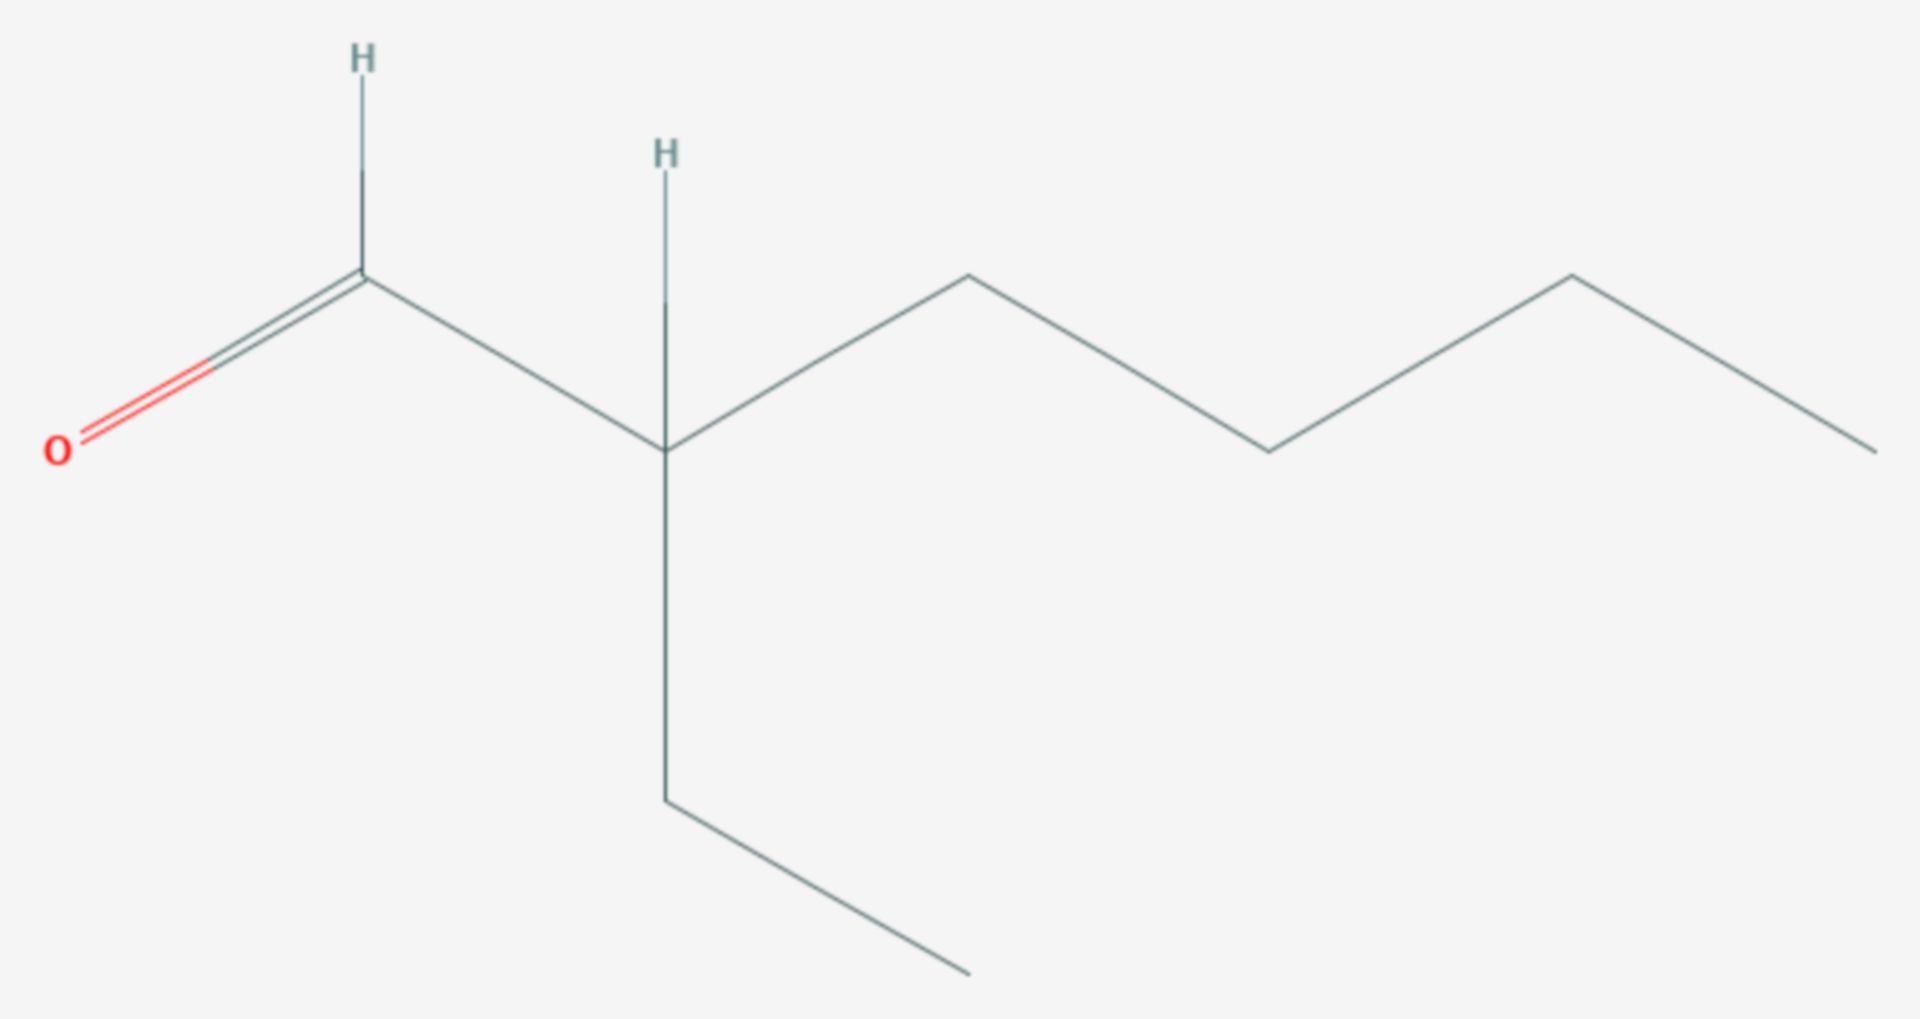 2-Ethylhexanal (Strukturformel)